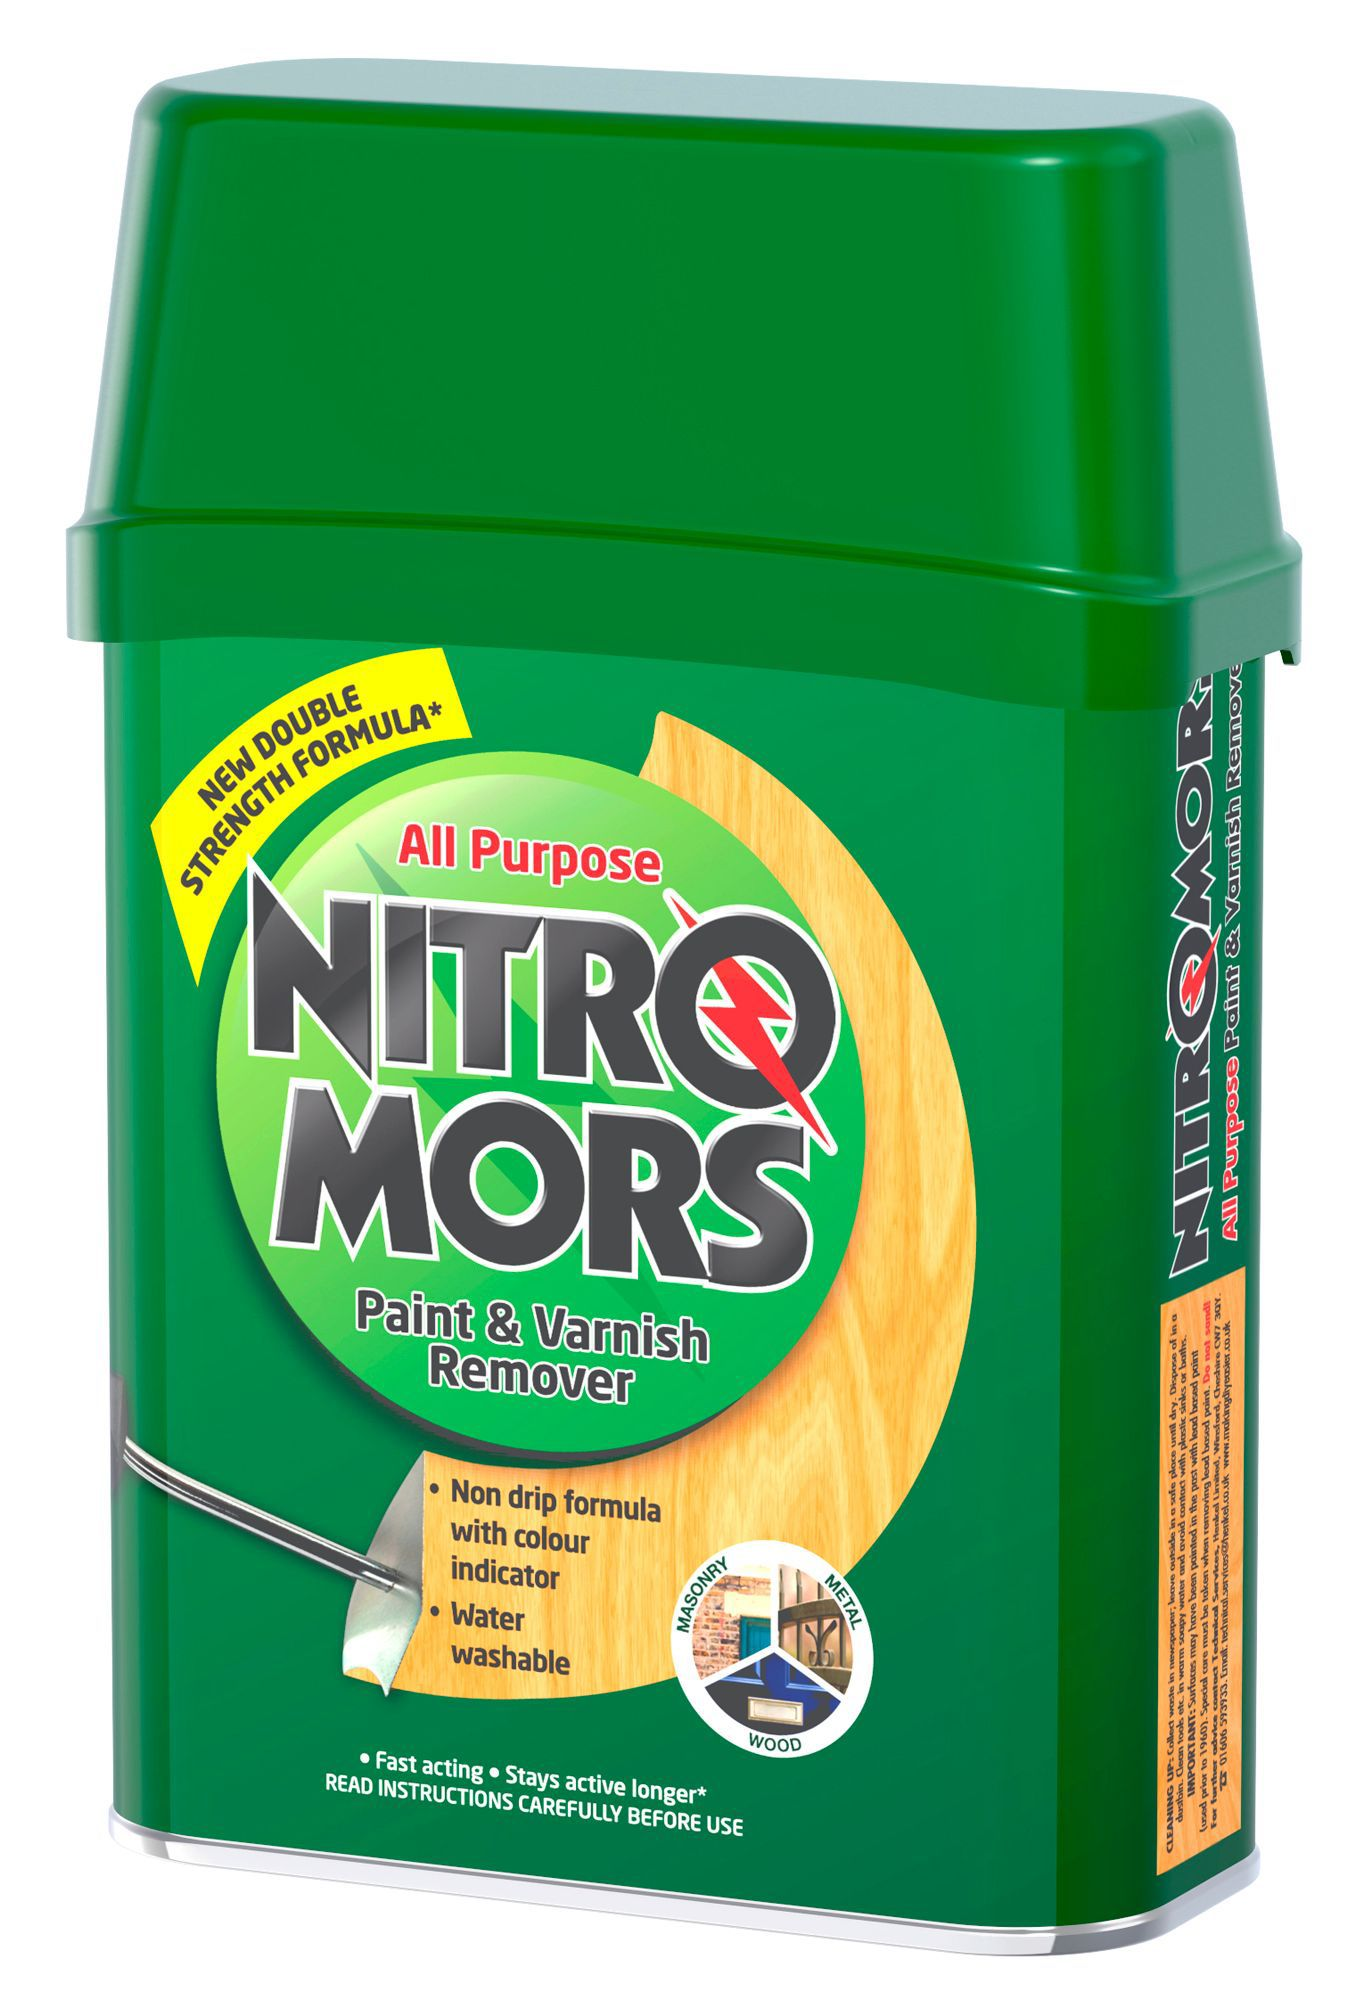 b&q kitchens kitchen pot hangers nitromors all purpose paint & varnish remover 375ml ...